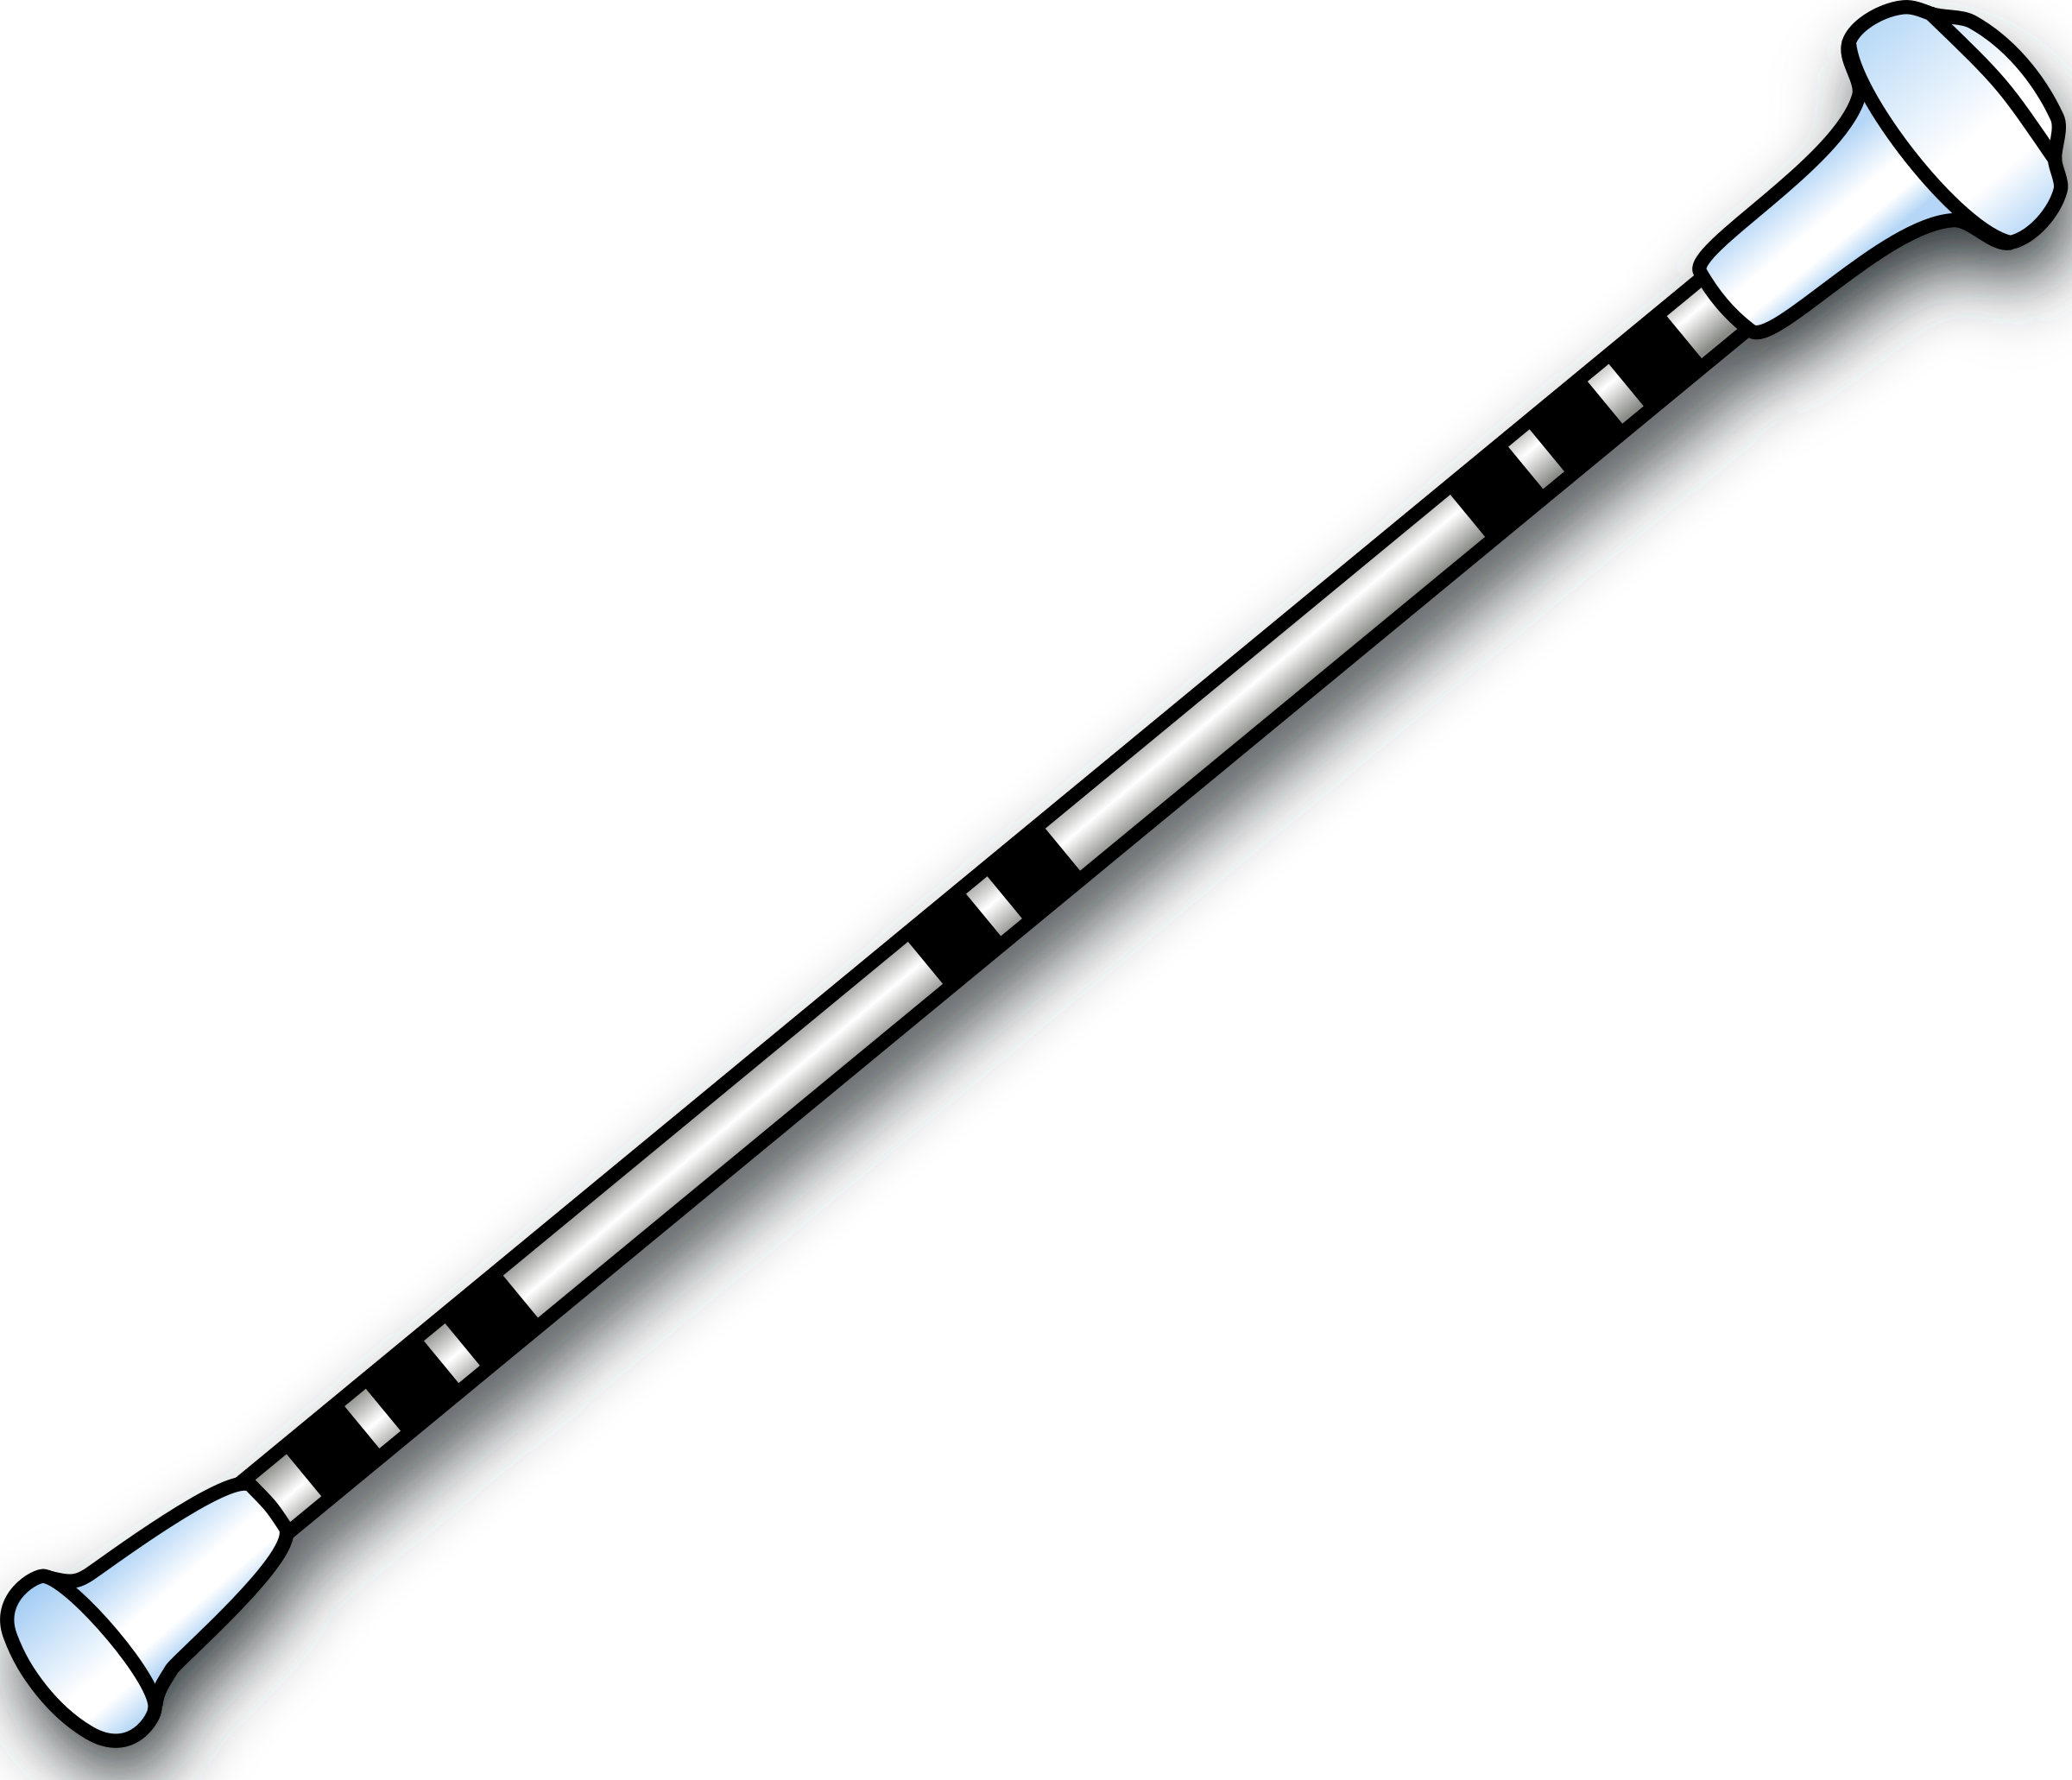 Baton Majorette Clip Art.